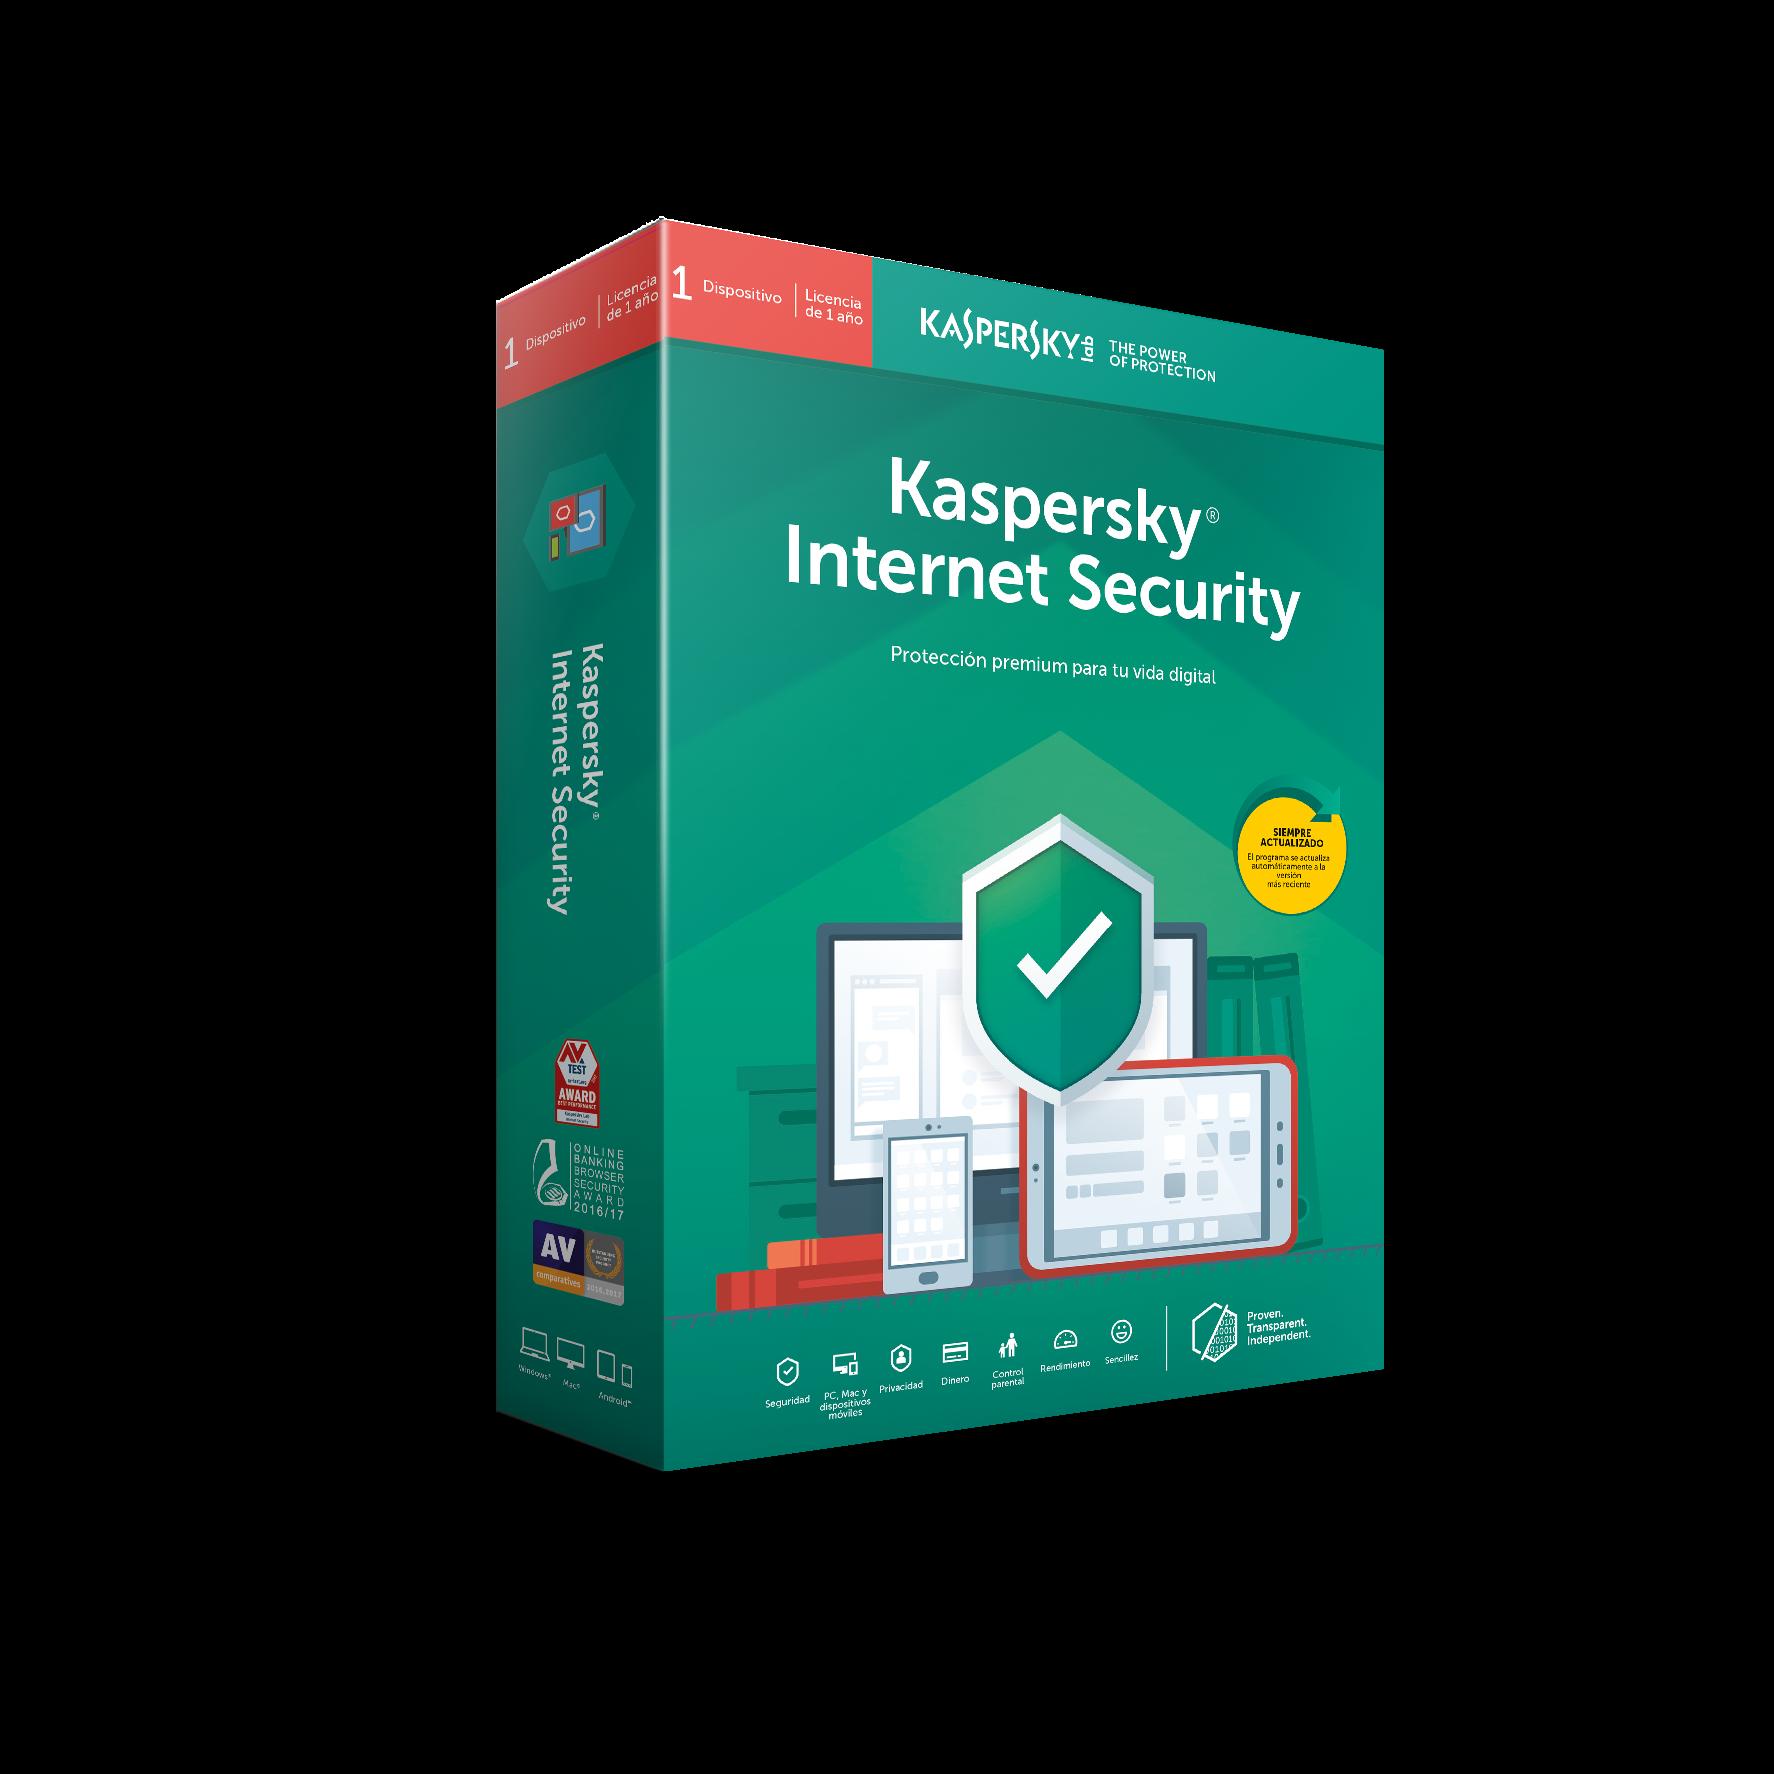 ANTIVIRUS KASPERSKY 2019 1 US INT SECURITY